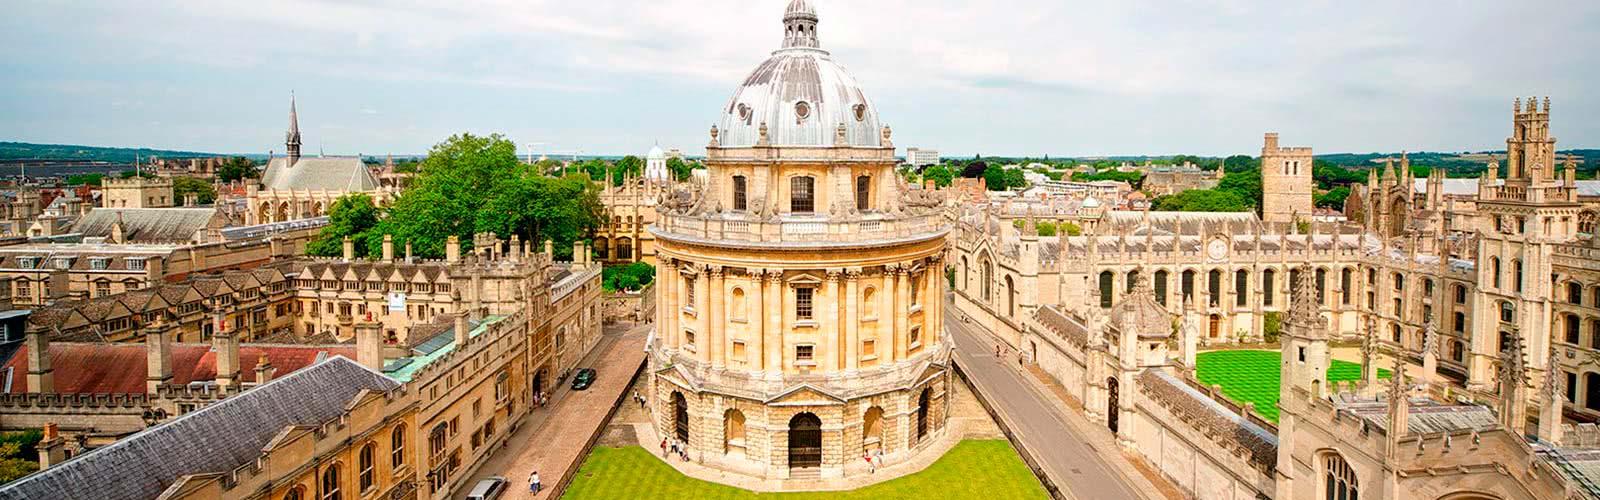 Cursos de inglés para adultos en Oxford 2020